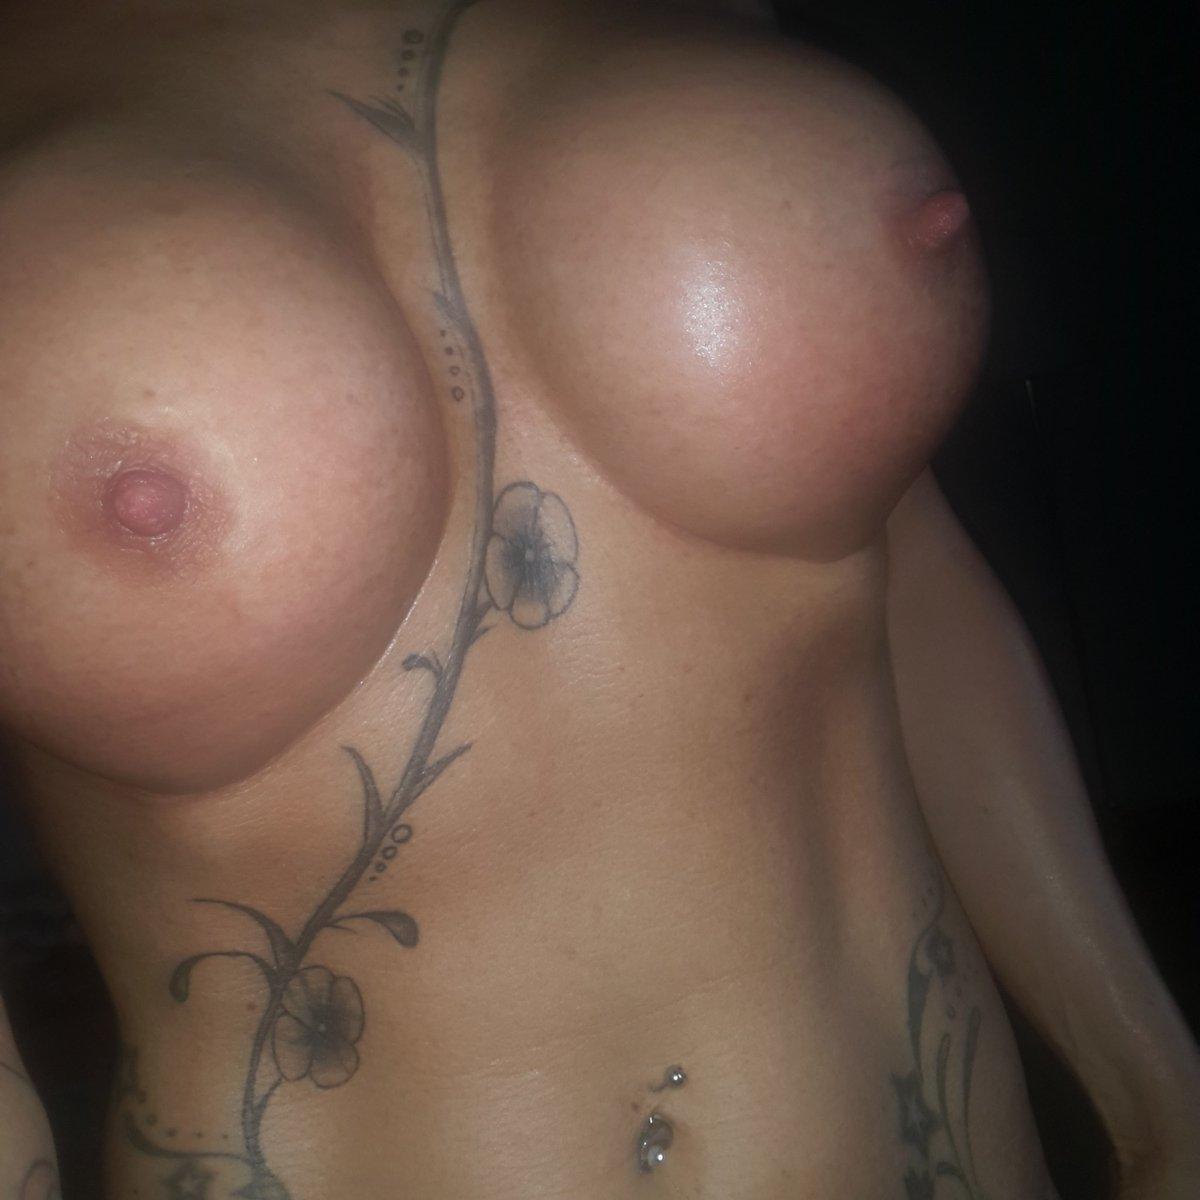 Susy gala anal